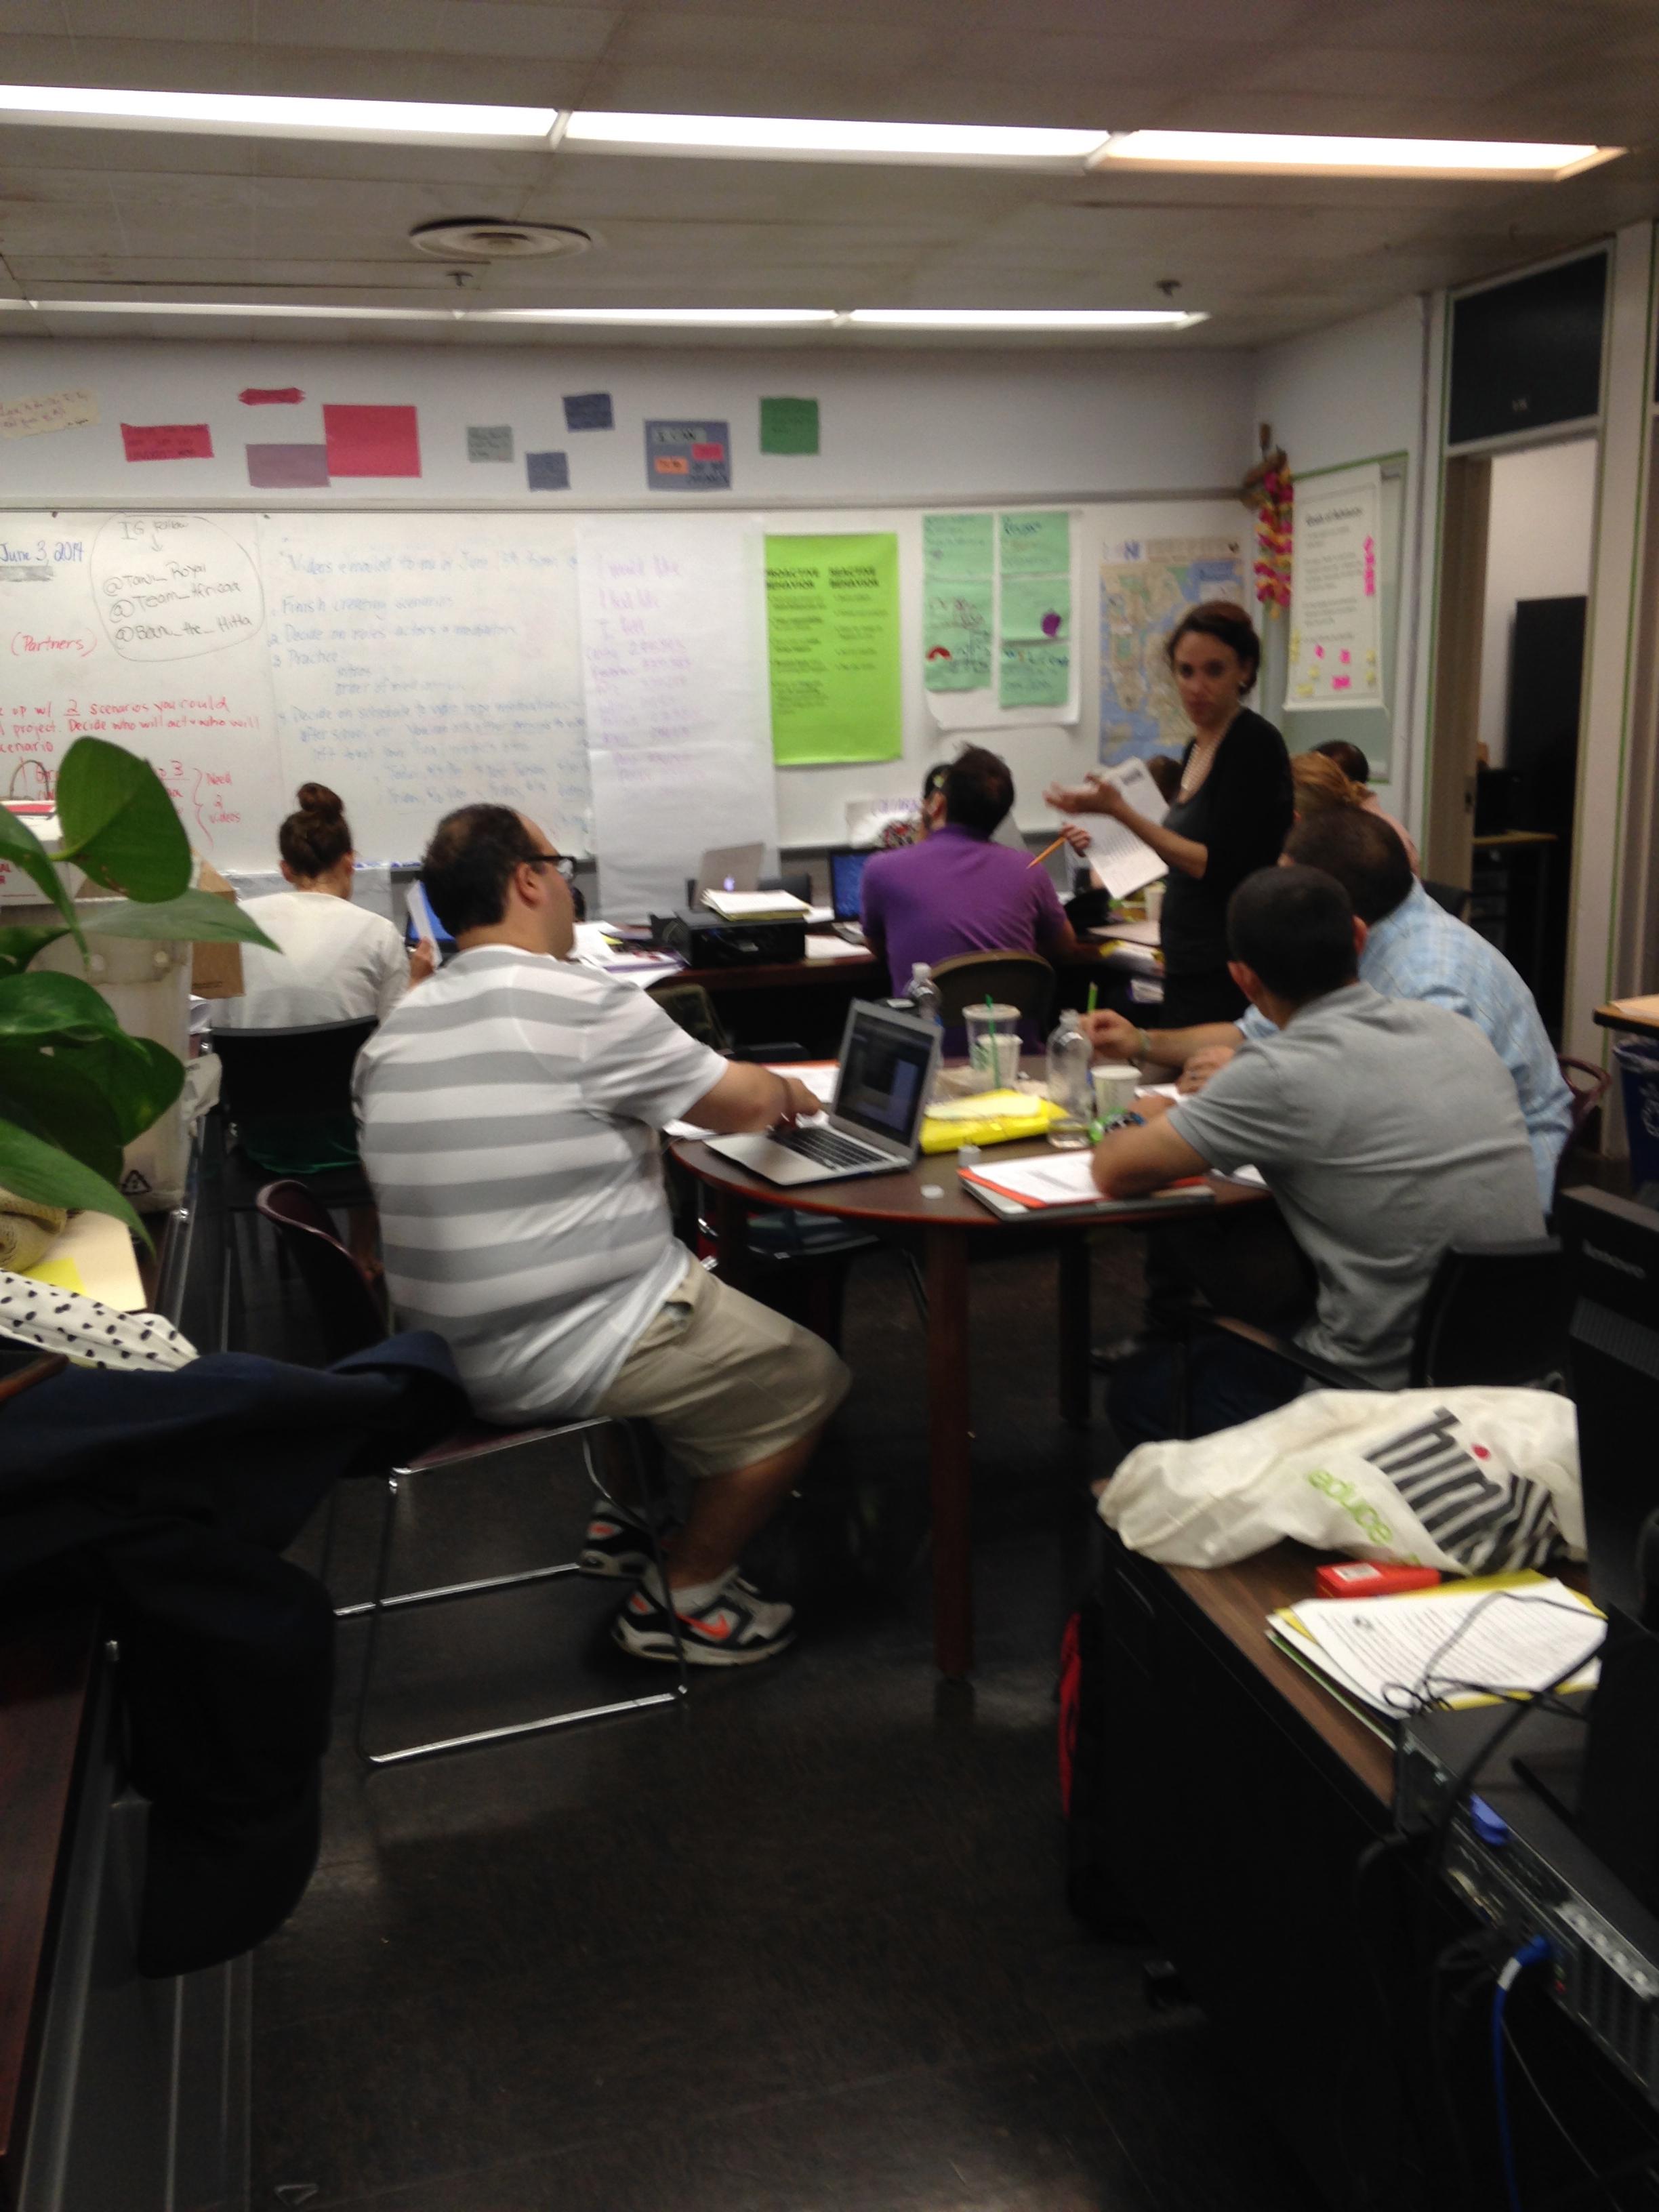 Teachers hard at work in the main office.